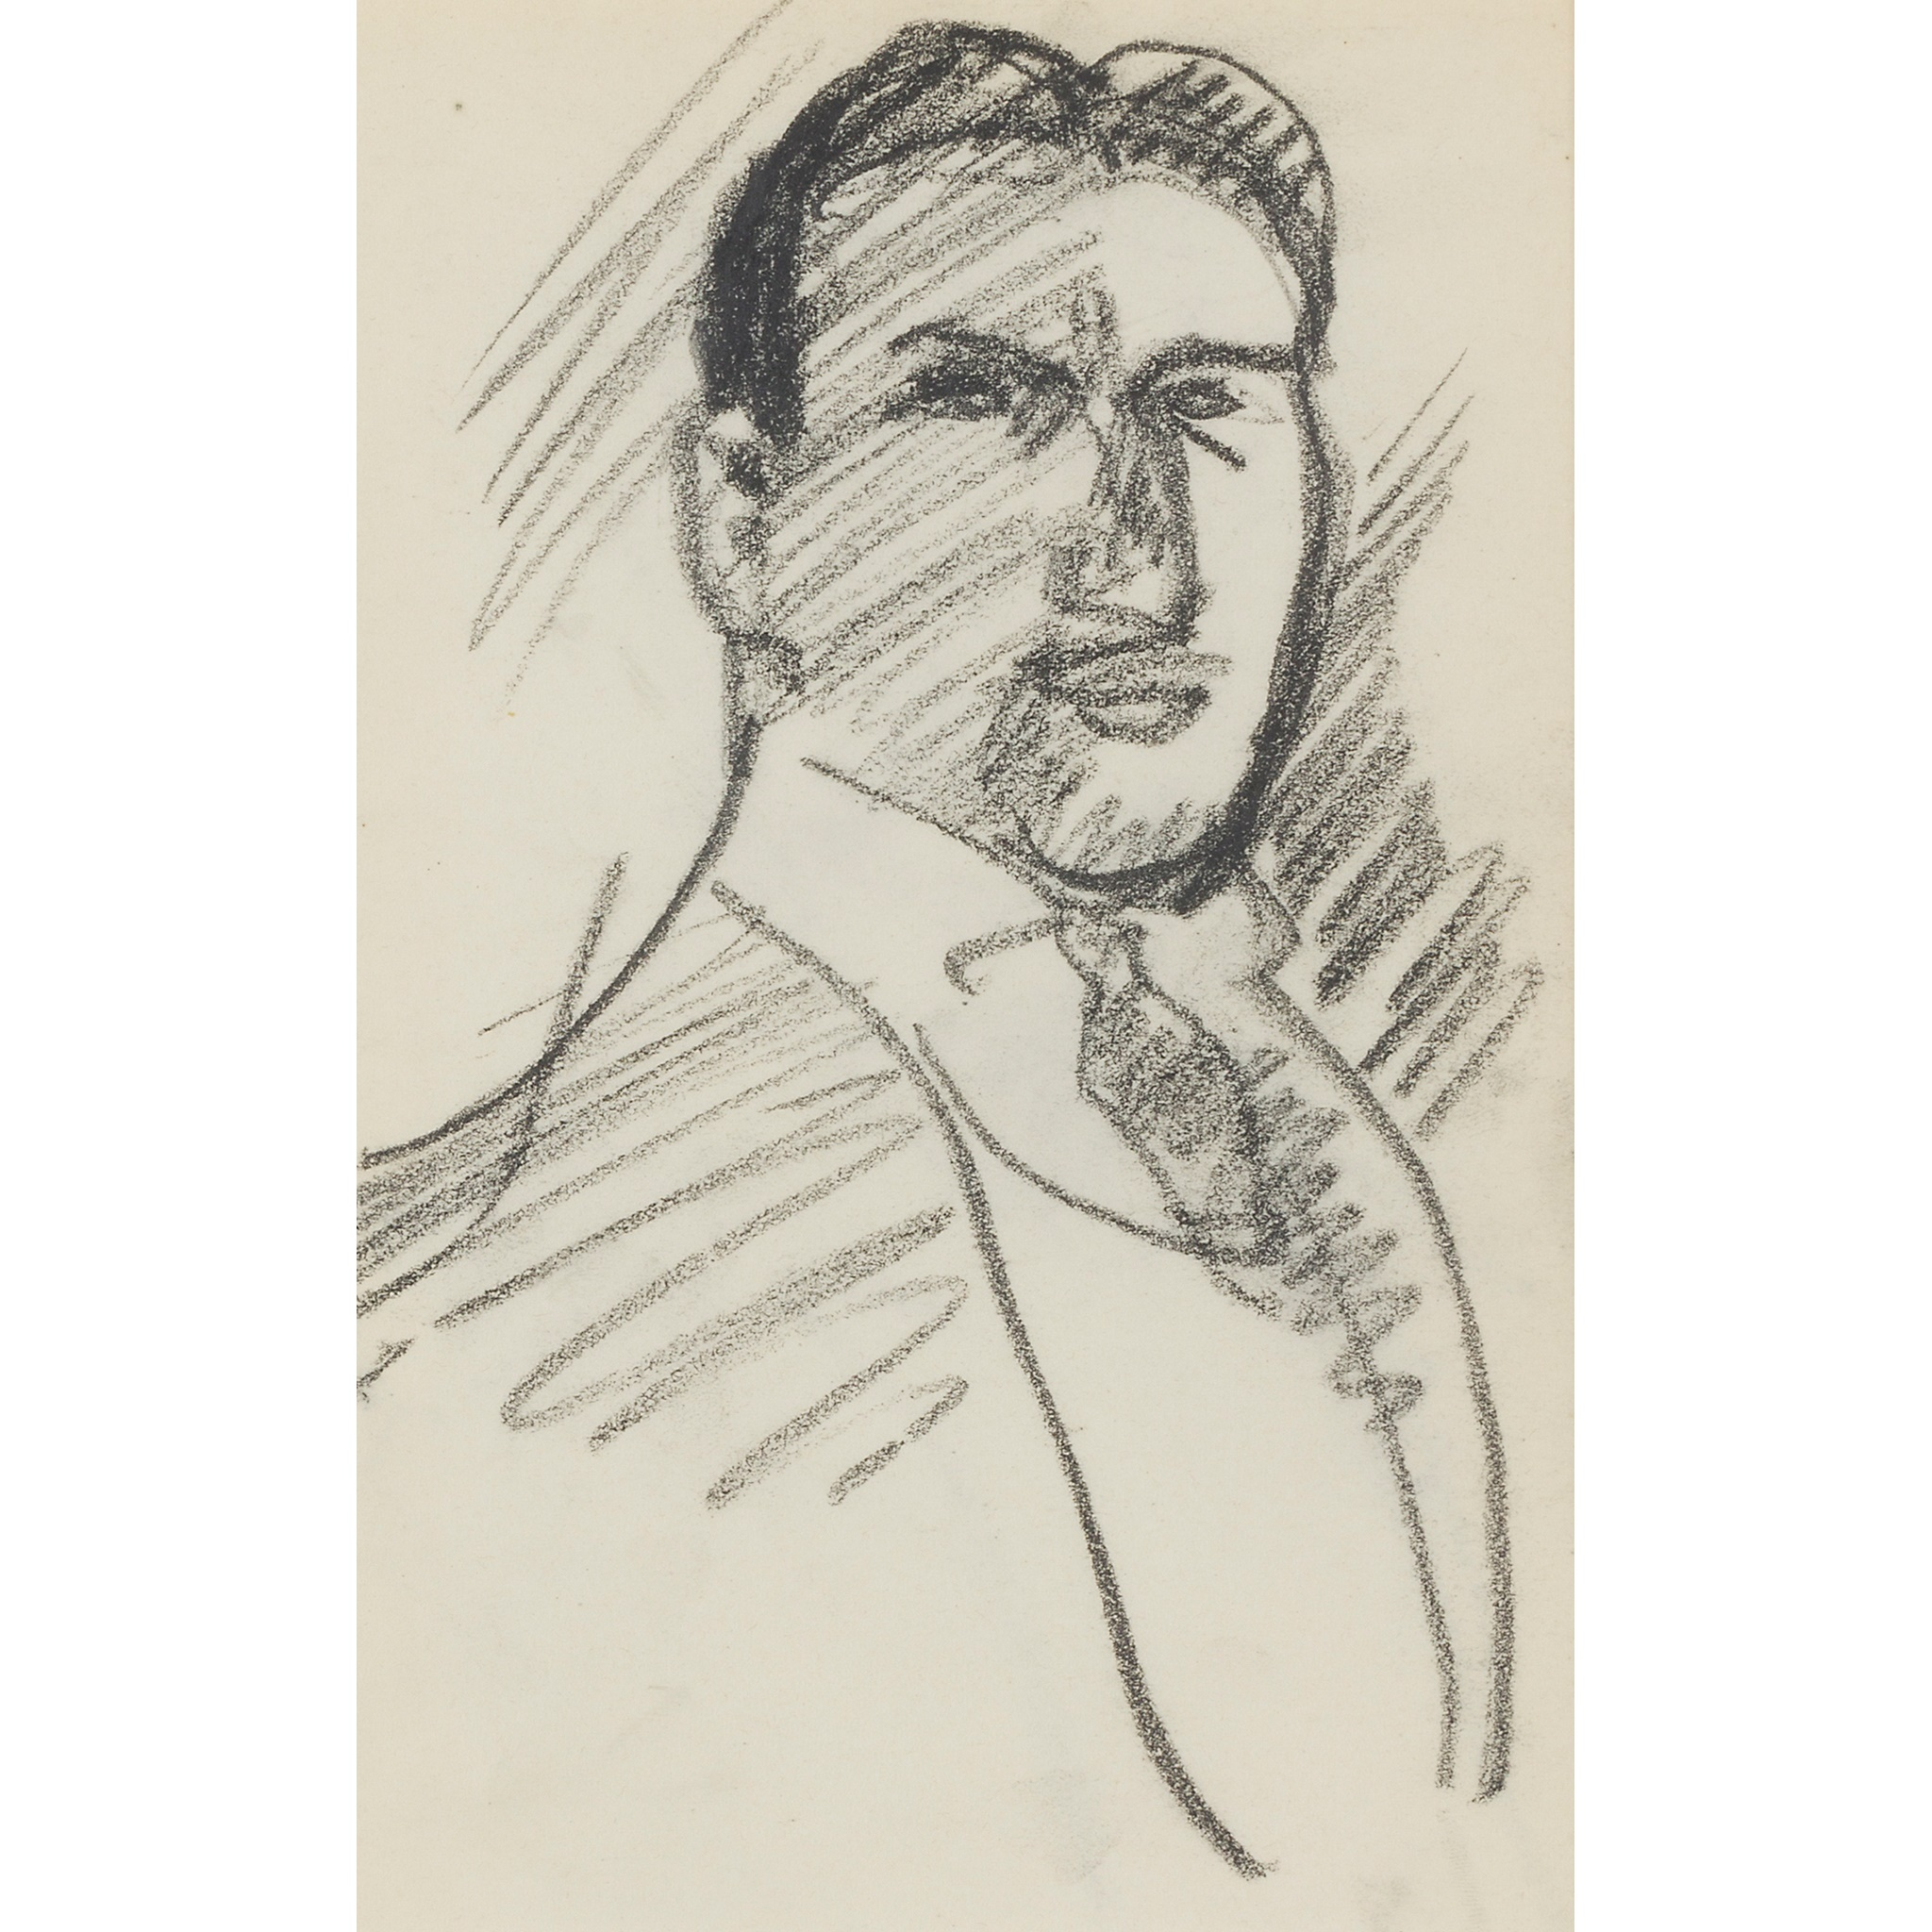 JOHN DUNCAN FERGUSSON R.B.A. (SCOTTISH 1874-1961) SELF PORTRAIT